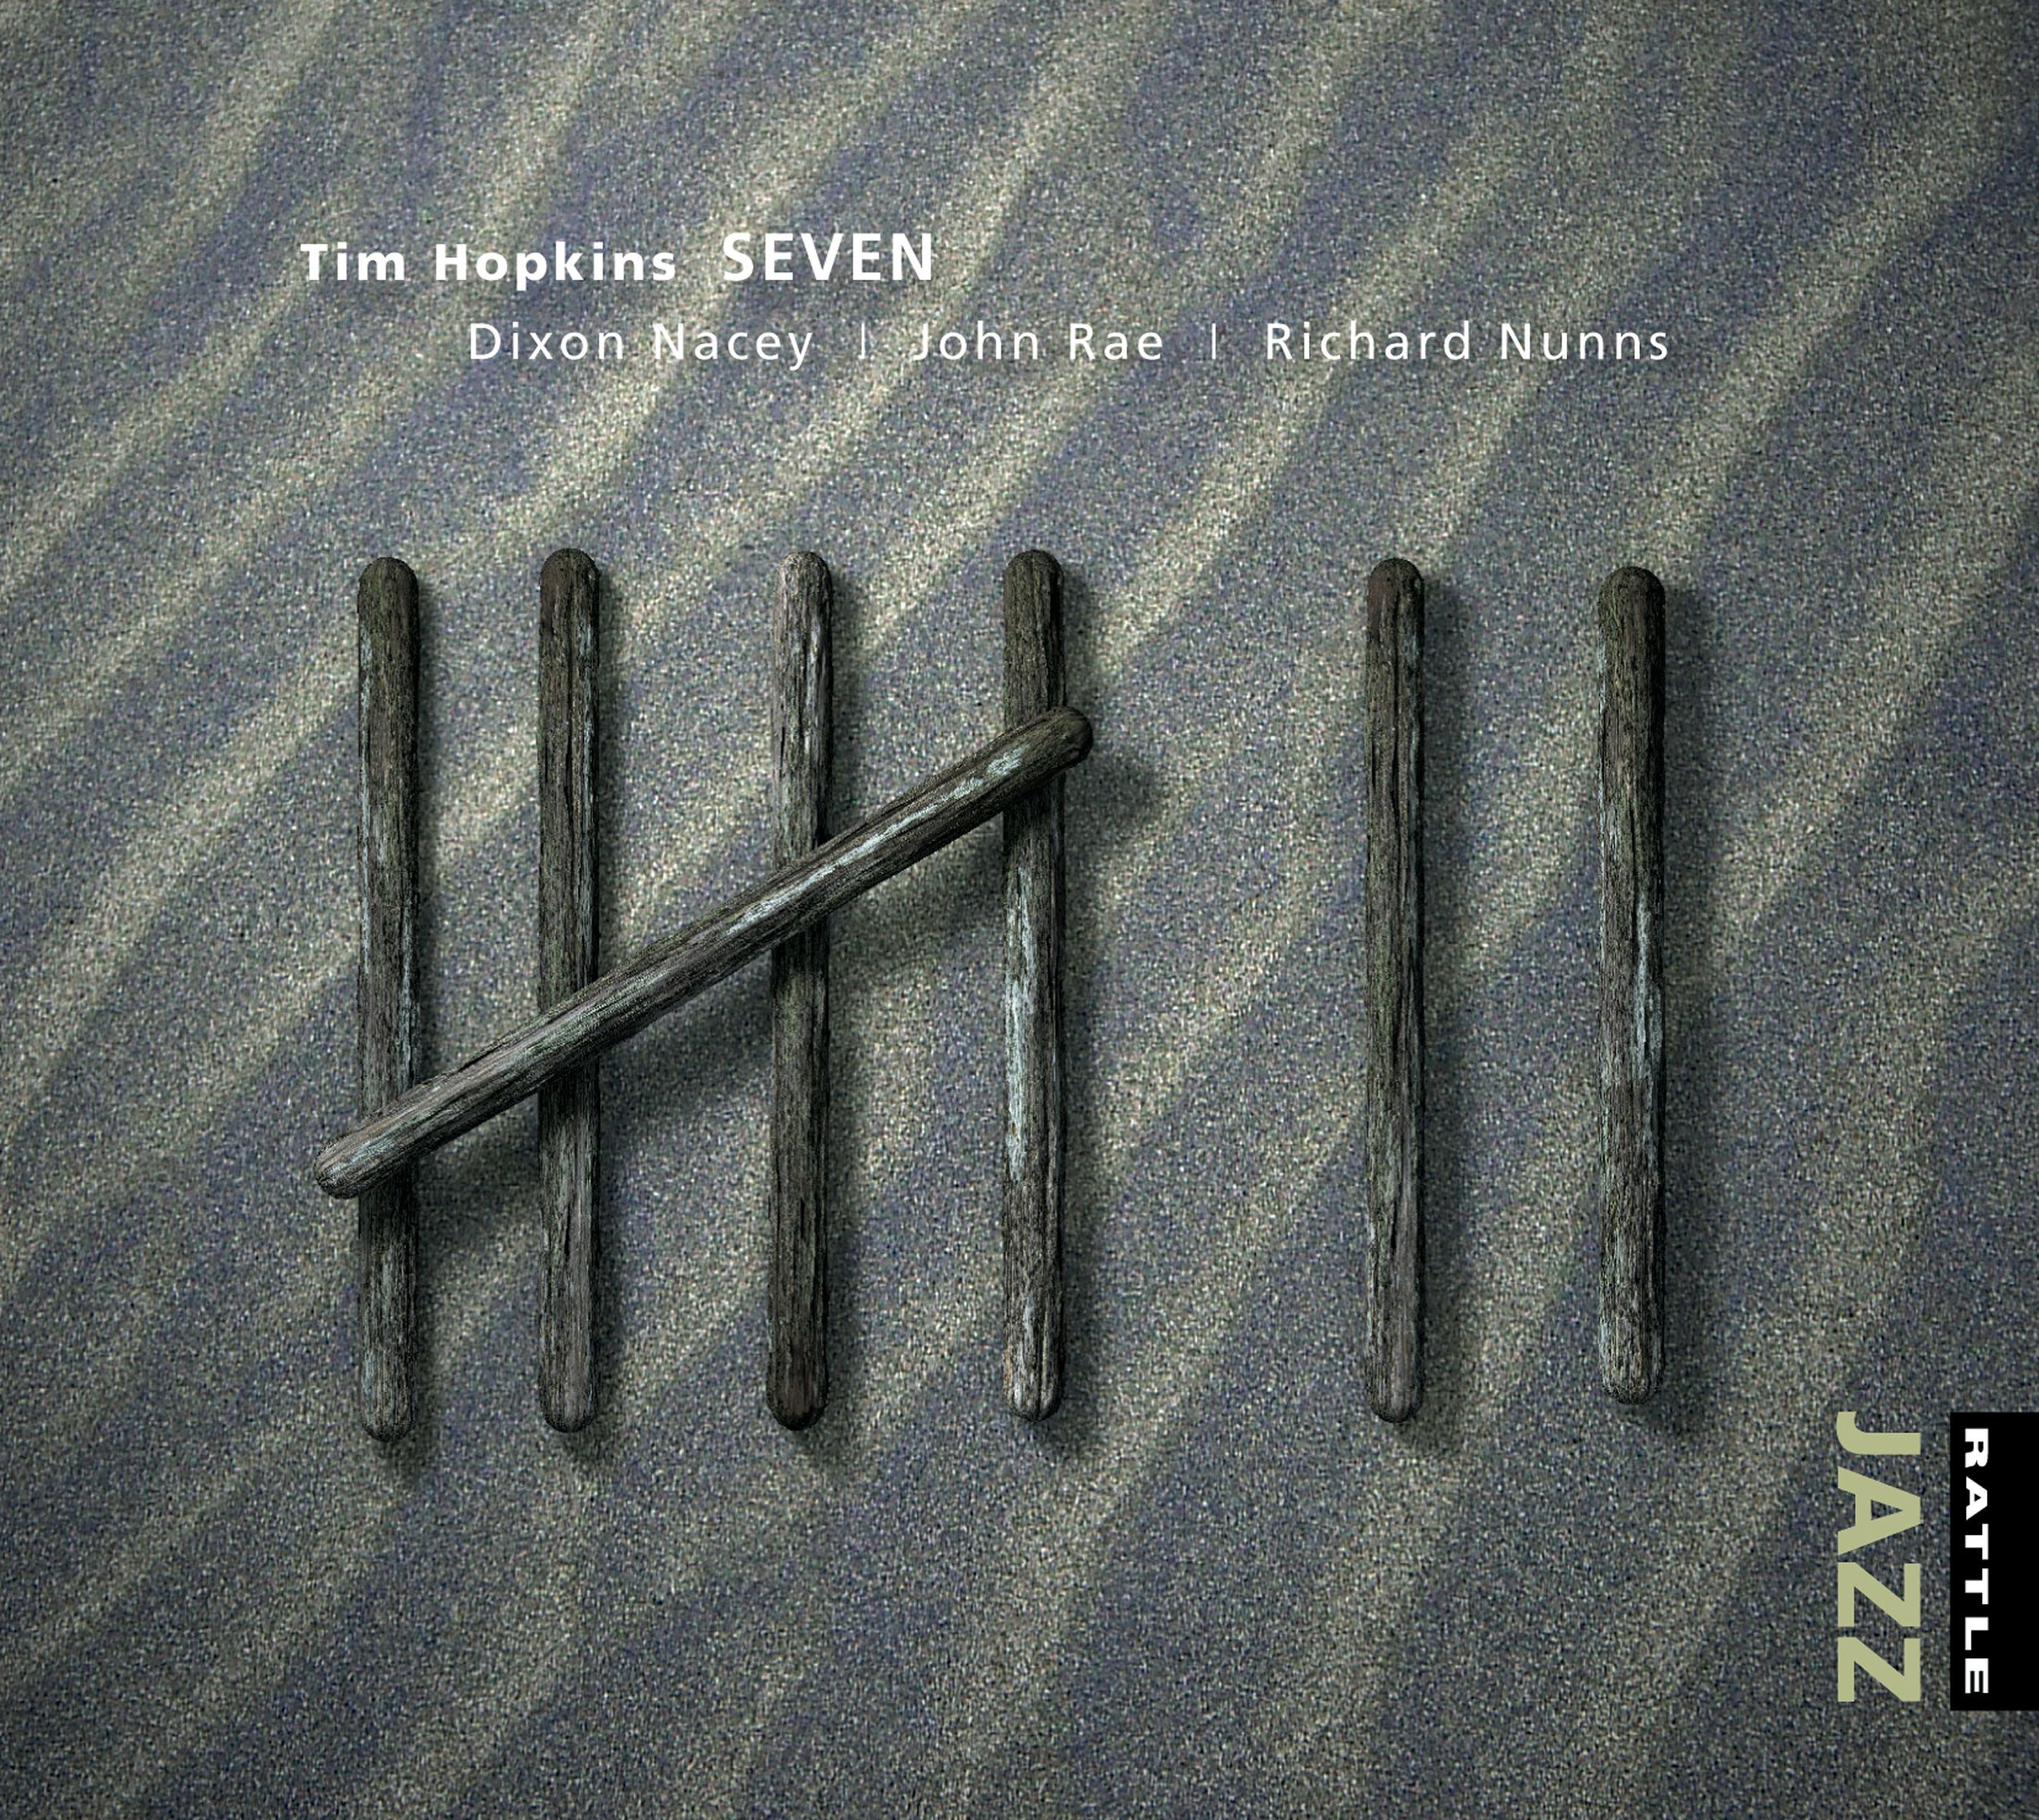 Tim Hopkins | Seven - downloadable MP3 ALBUM